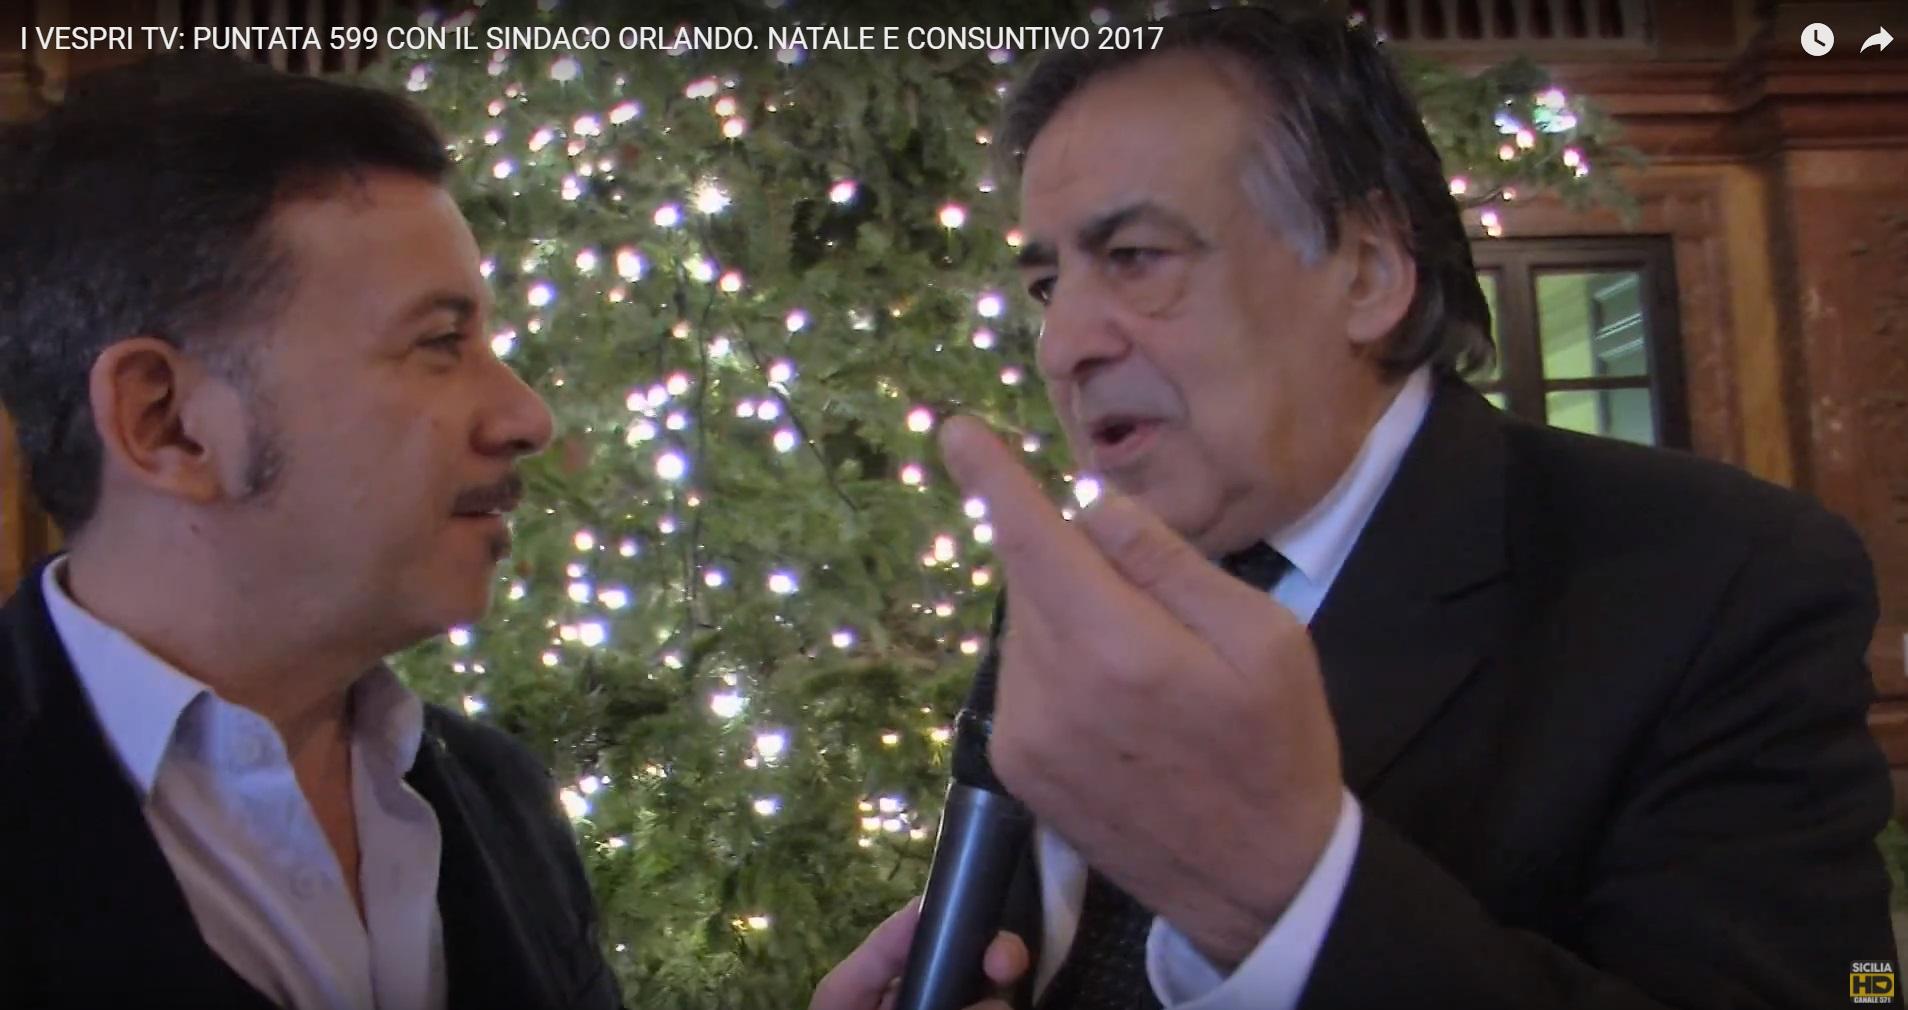 Siciliahd: Panasci - Leoluca Orlando - consuntivo e Buon Natale